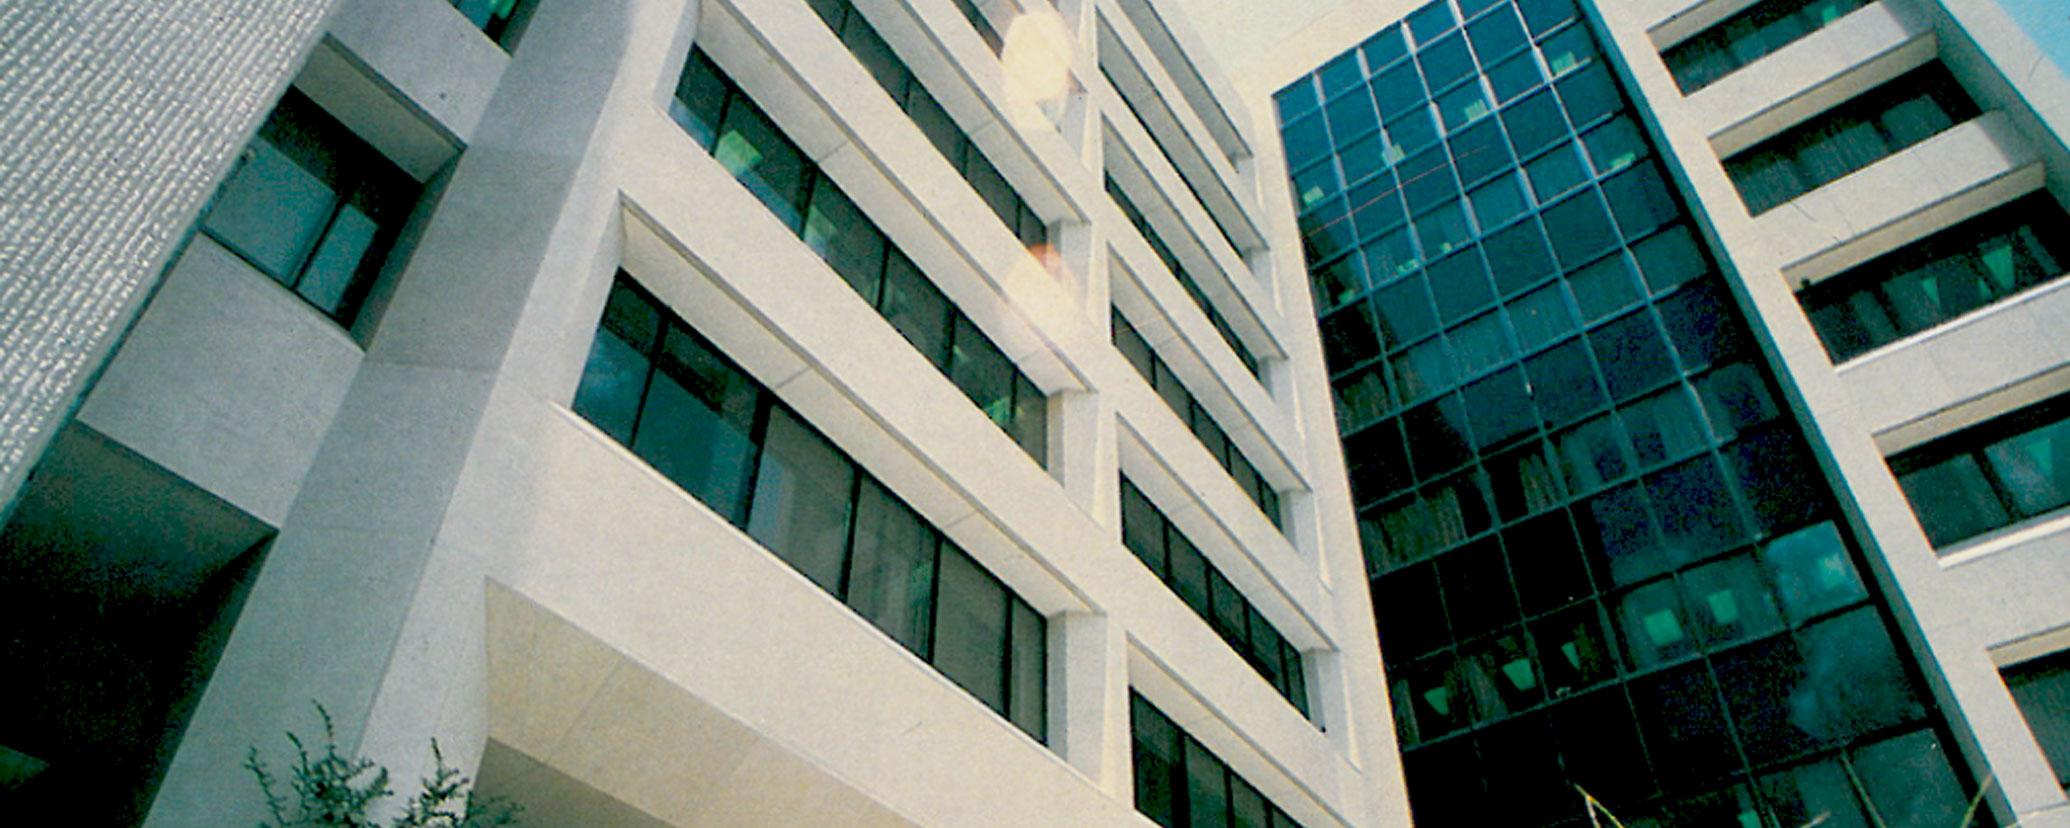 Medical School University of TexasHouston, TX - Caddell